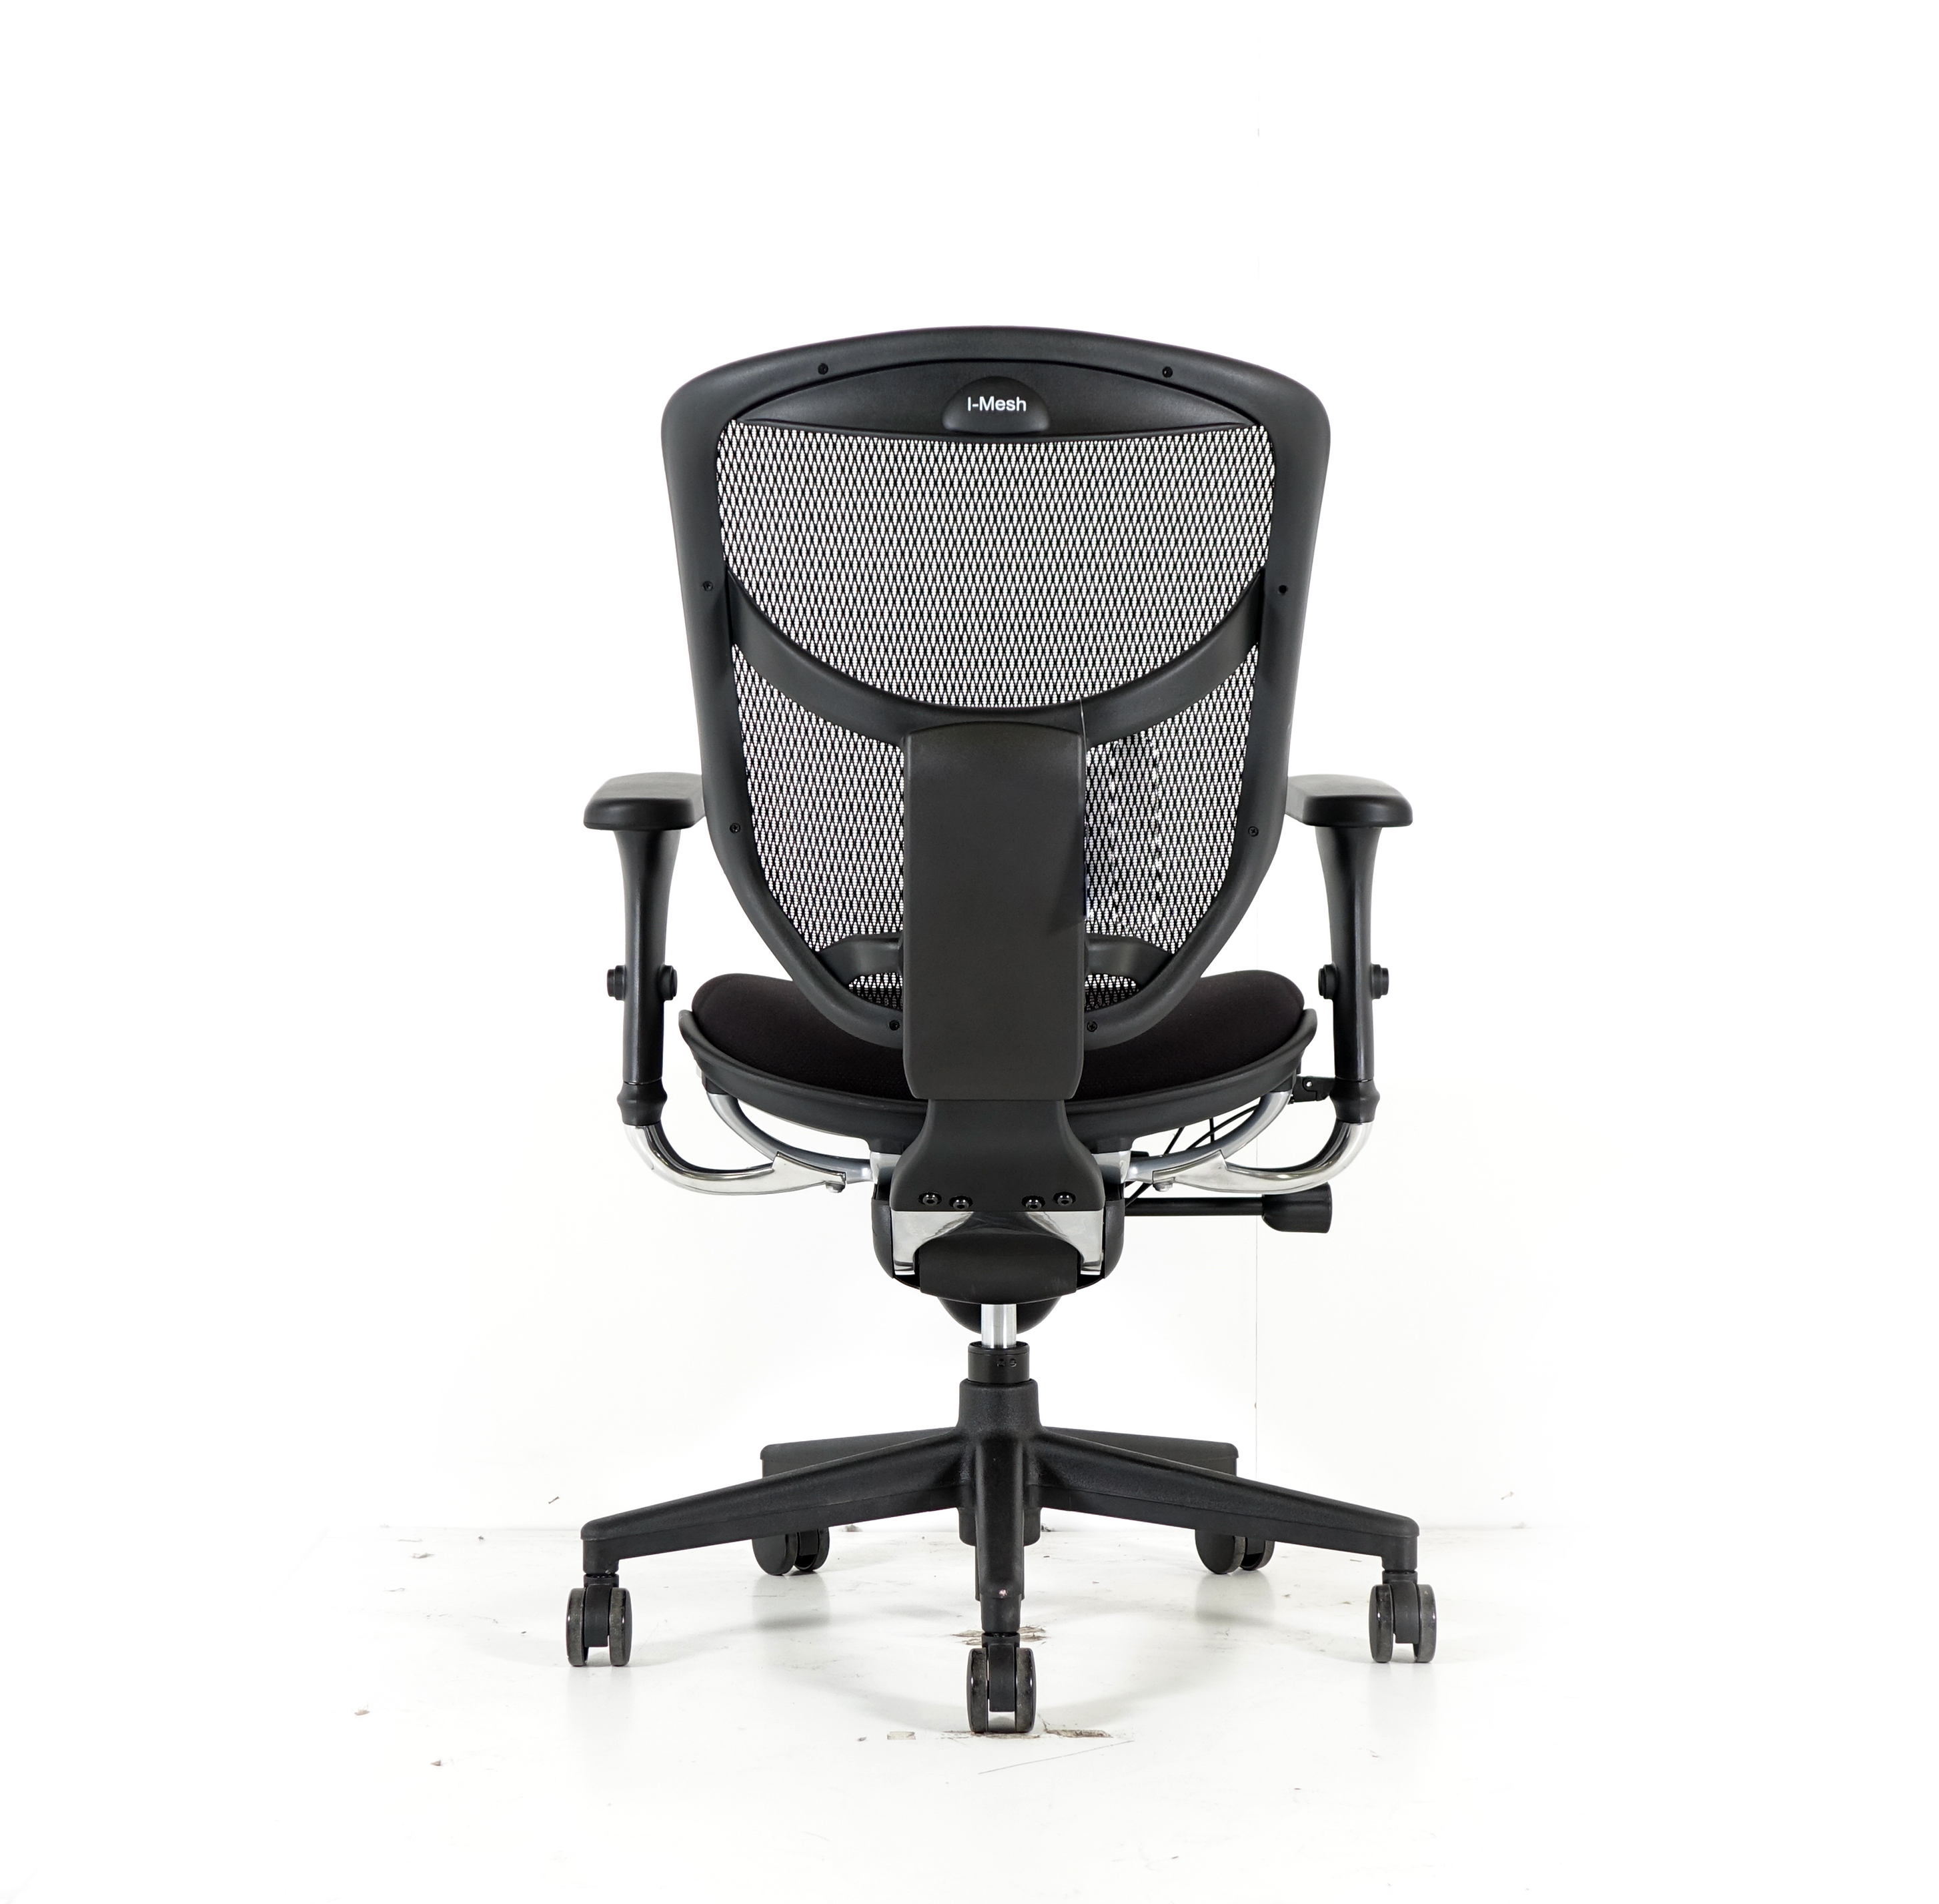 IMesh Office Chair